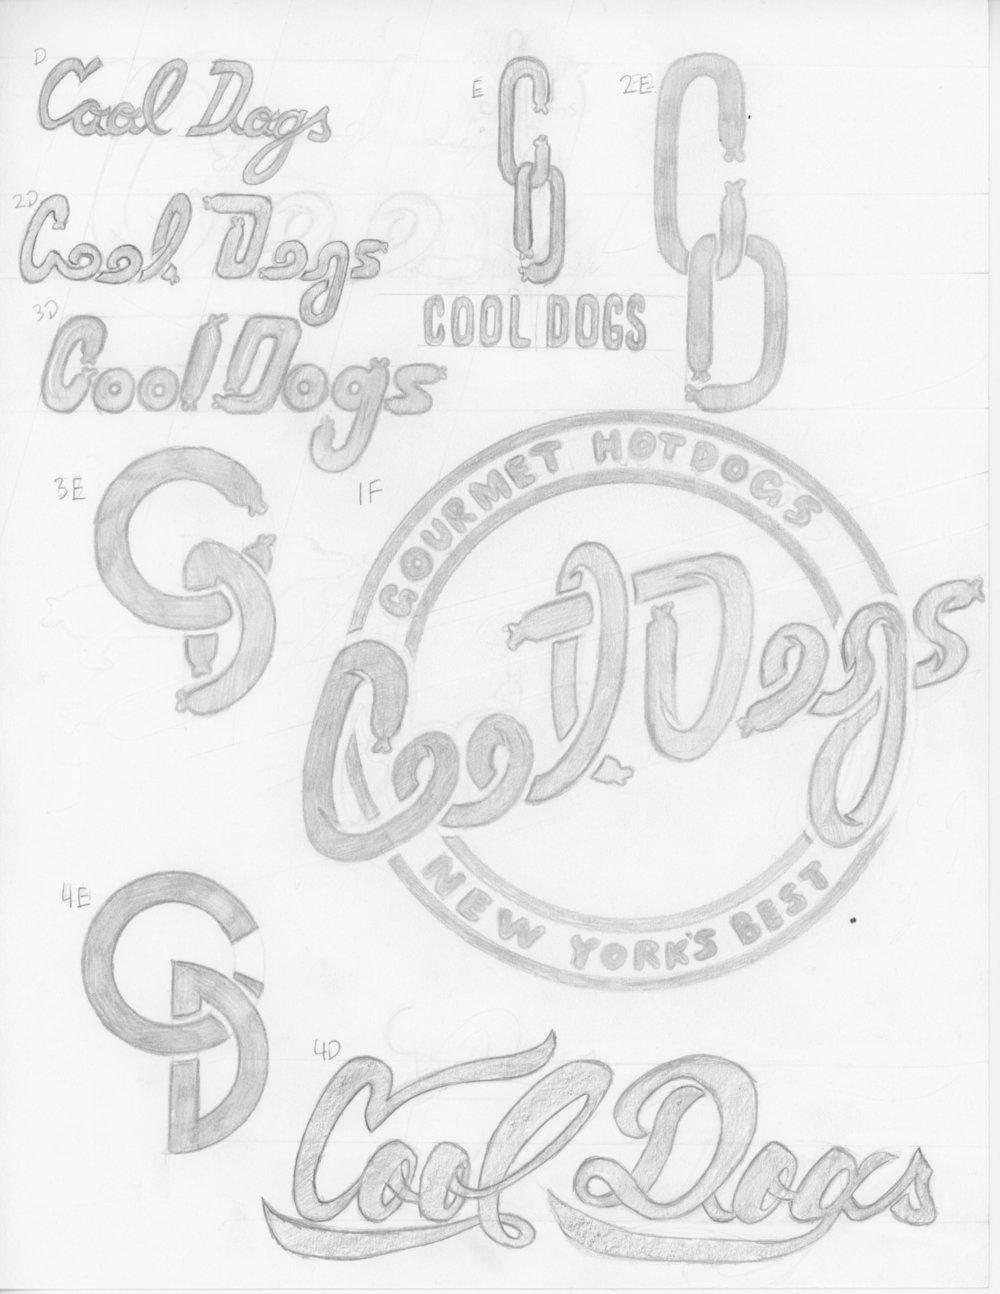 cooldogs-logo-branding-logodesign-hotdog-food-brand-orozcodesign-roberto-orozco-artist-graphicdesign-vegas-lasvegas-foodbrand-sketches3.jpg